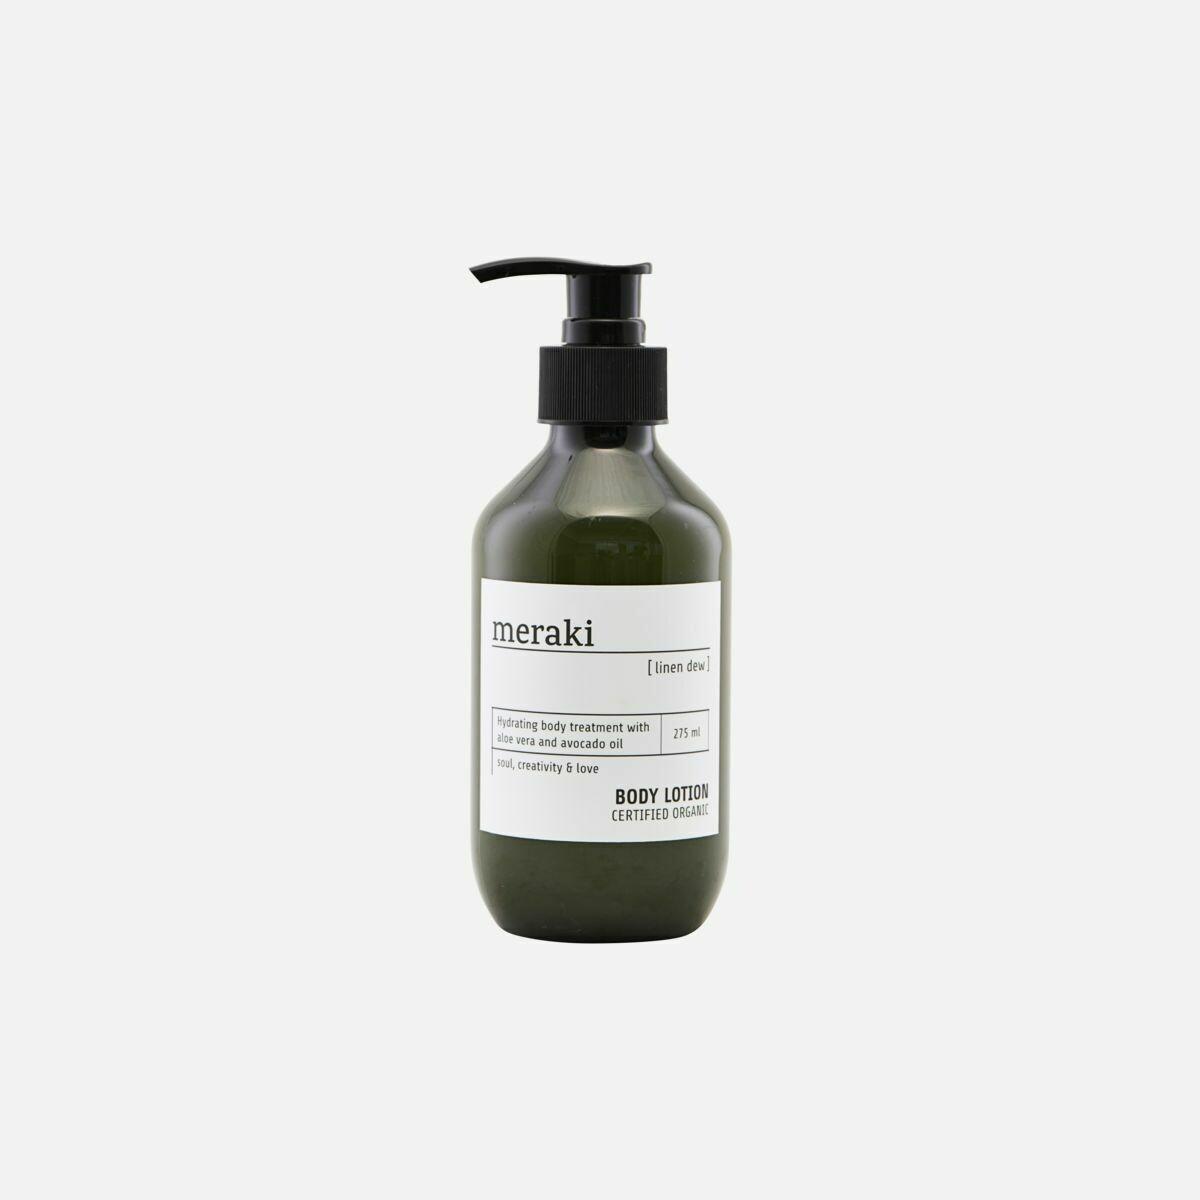 Body lotion, Linen dew, 275ml